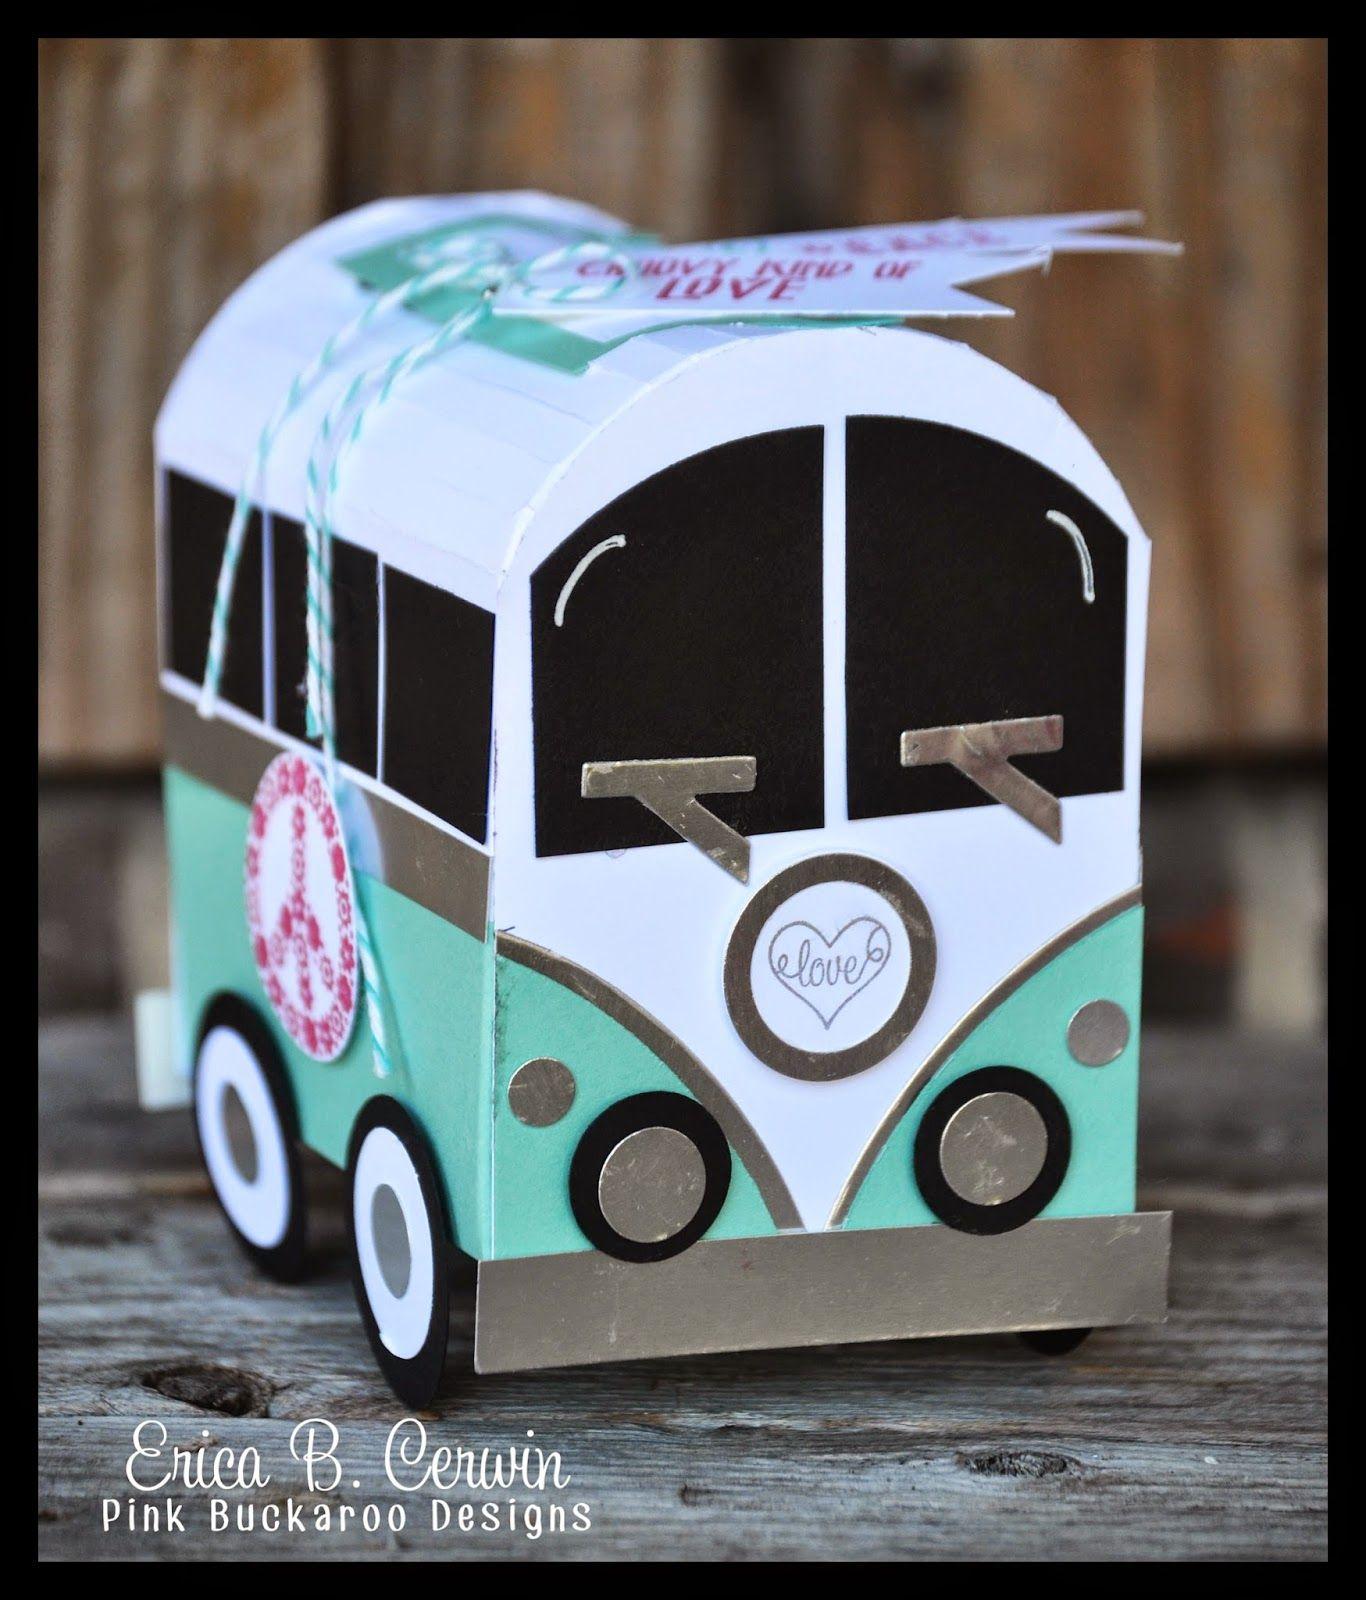 Pink Buckaroo Designs VW Love Bus Candy Holder